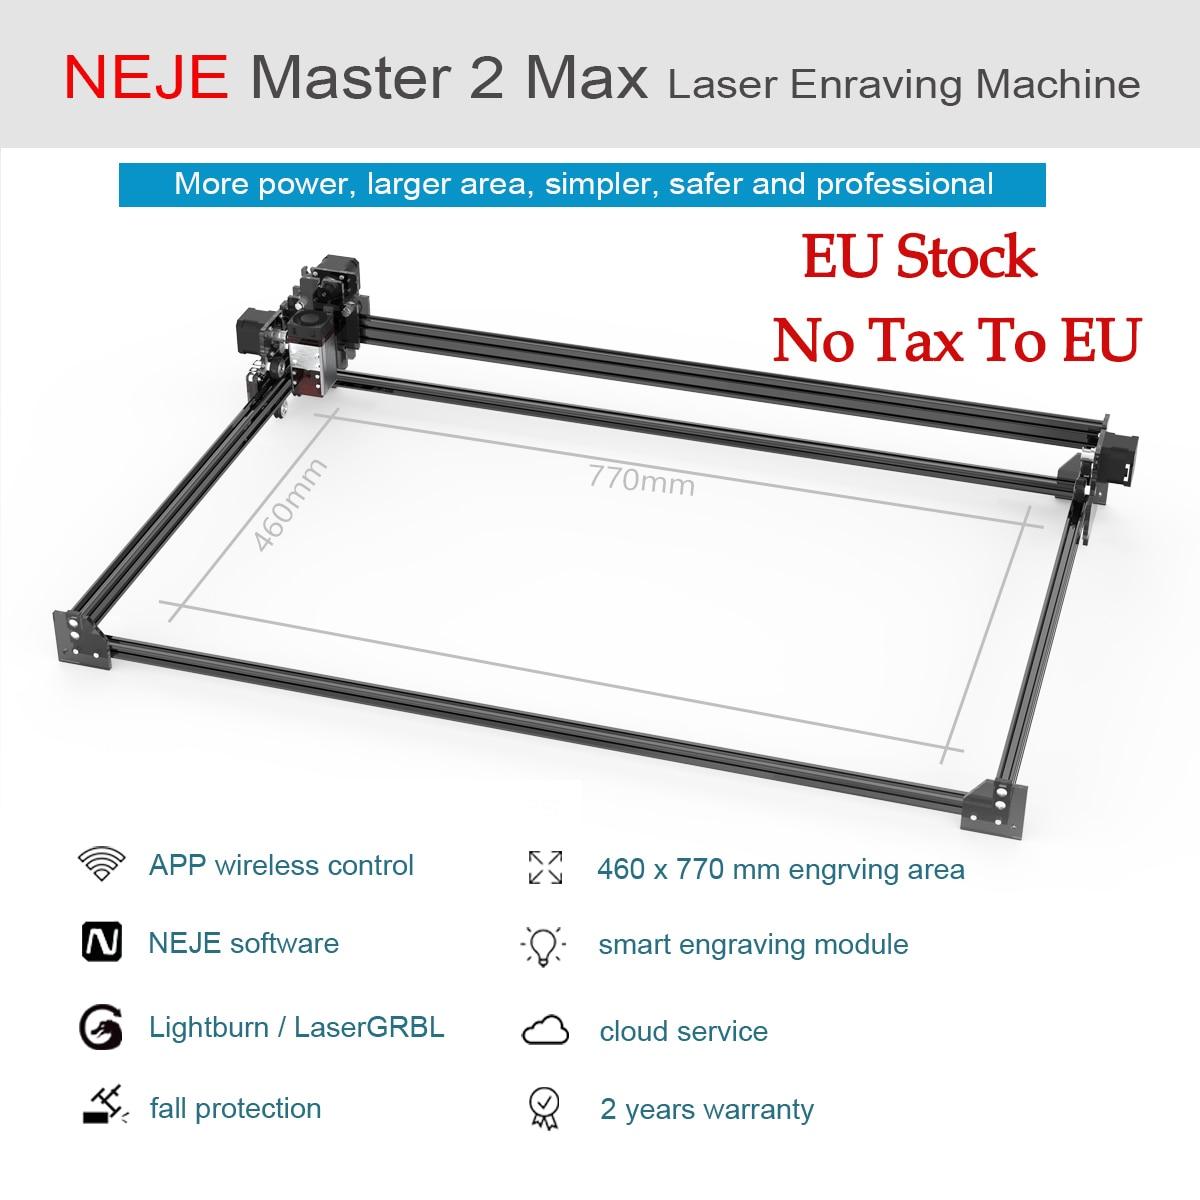 2020 NEJE Master 2S Max 460 x 810 mm Professional Laser Engraving Machine, Laser Cutter - Lightburn - Bluetooth - App Control